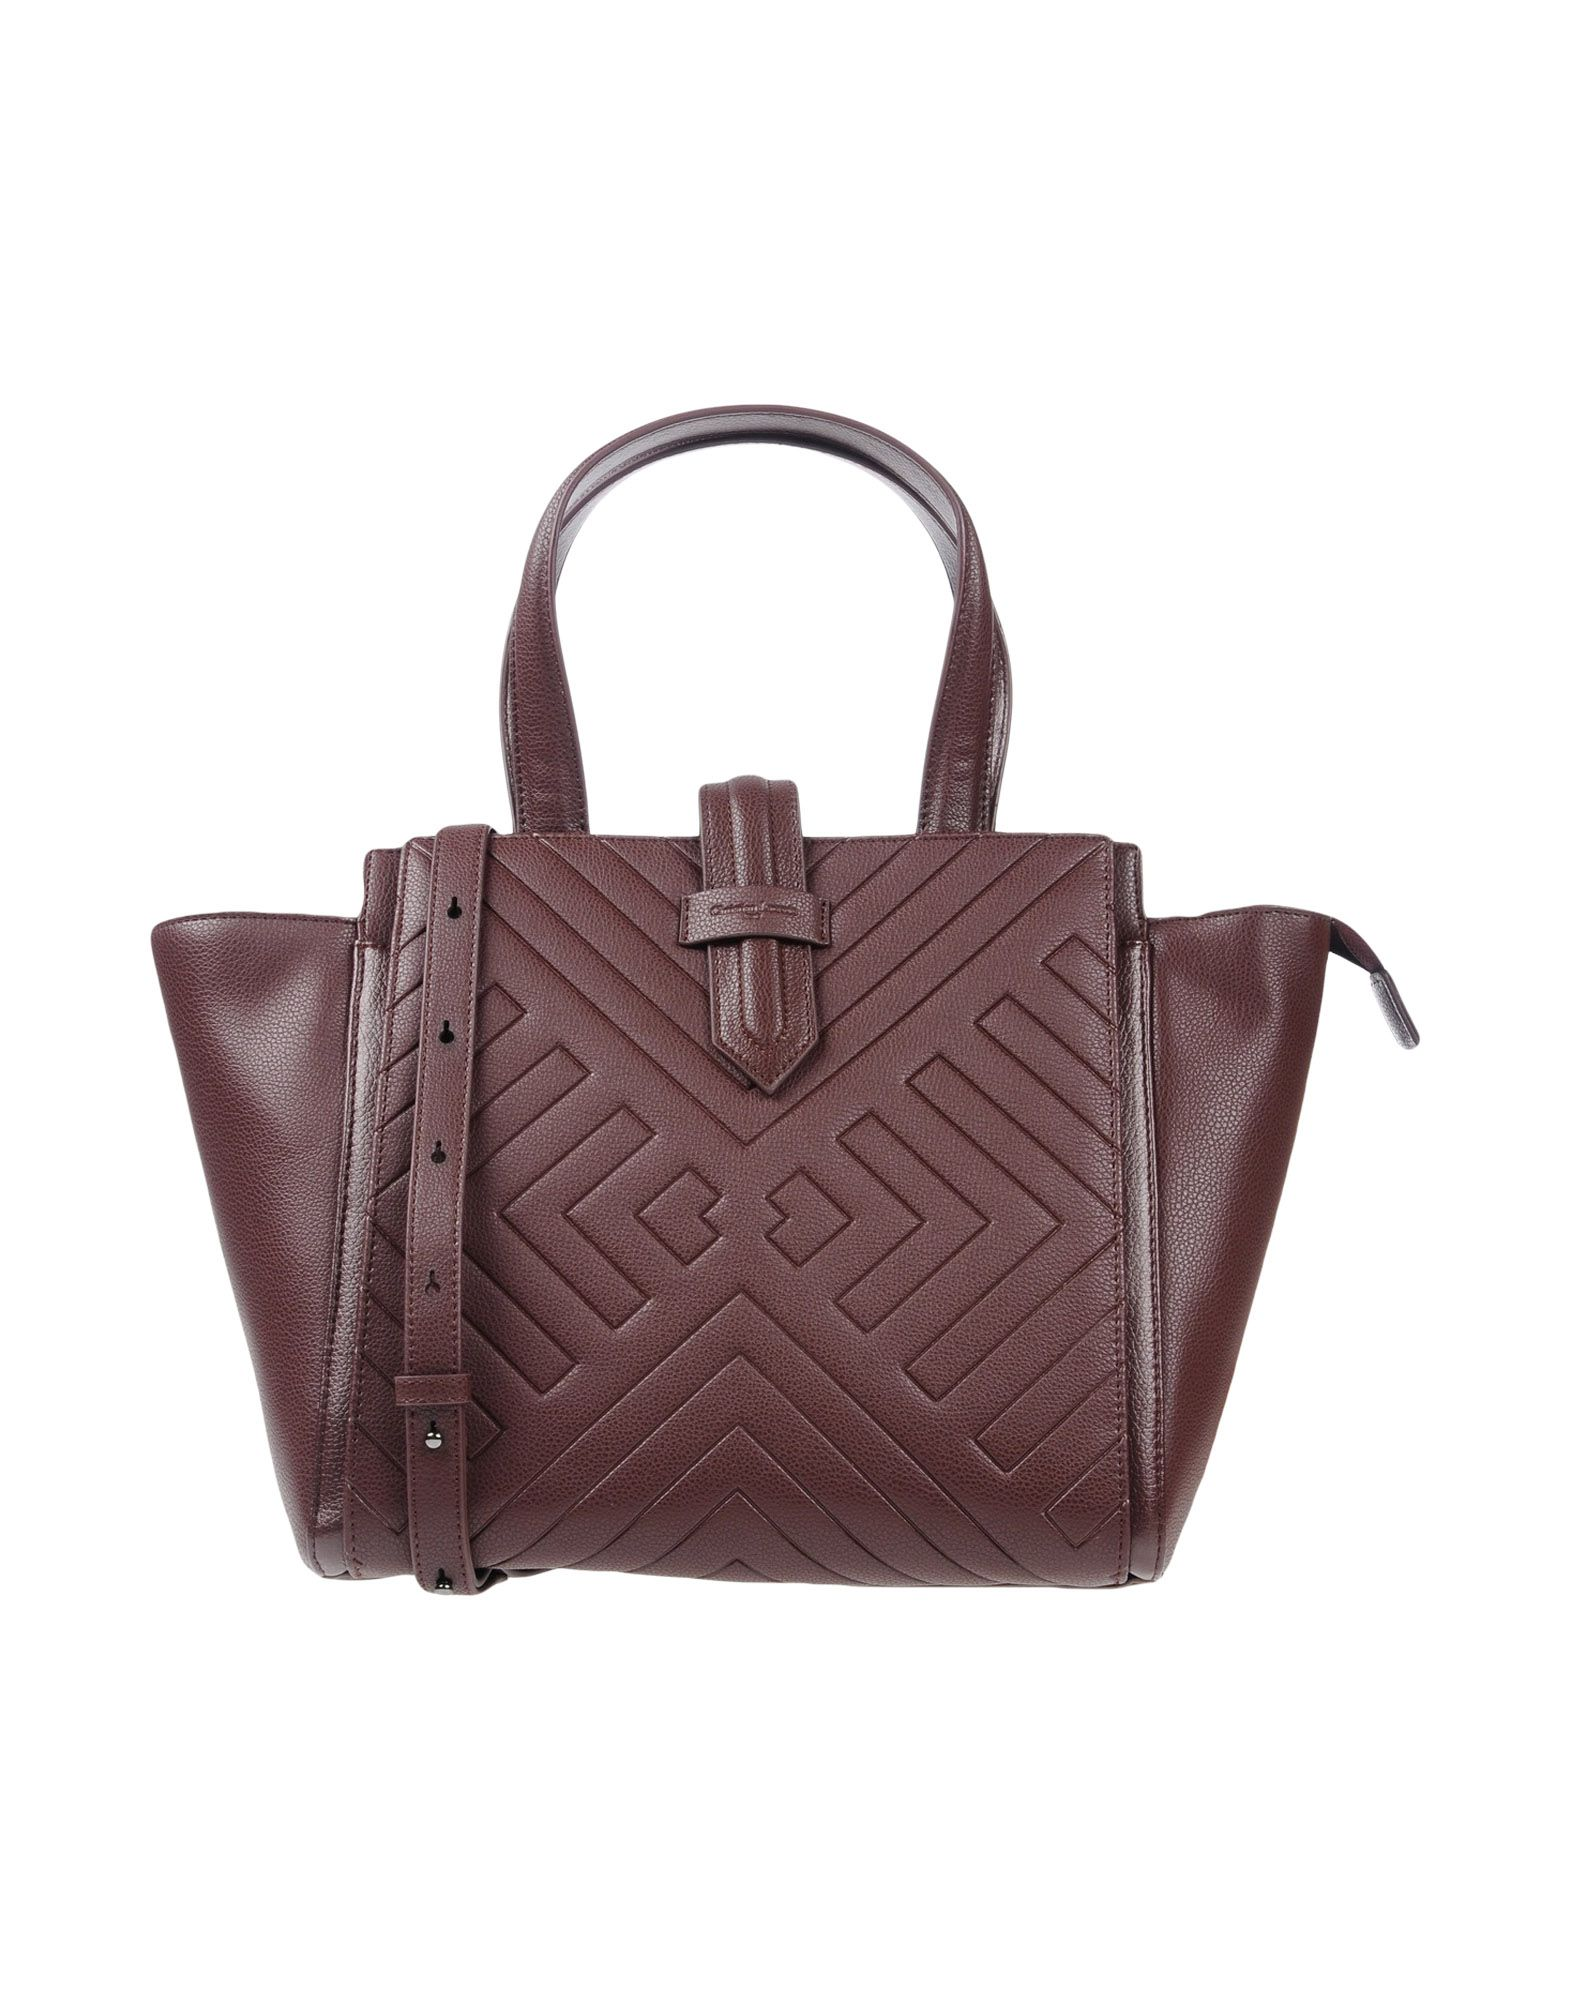 CHRISTIAN LACROIX Handbag in Deep Purple